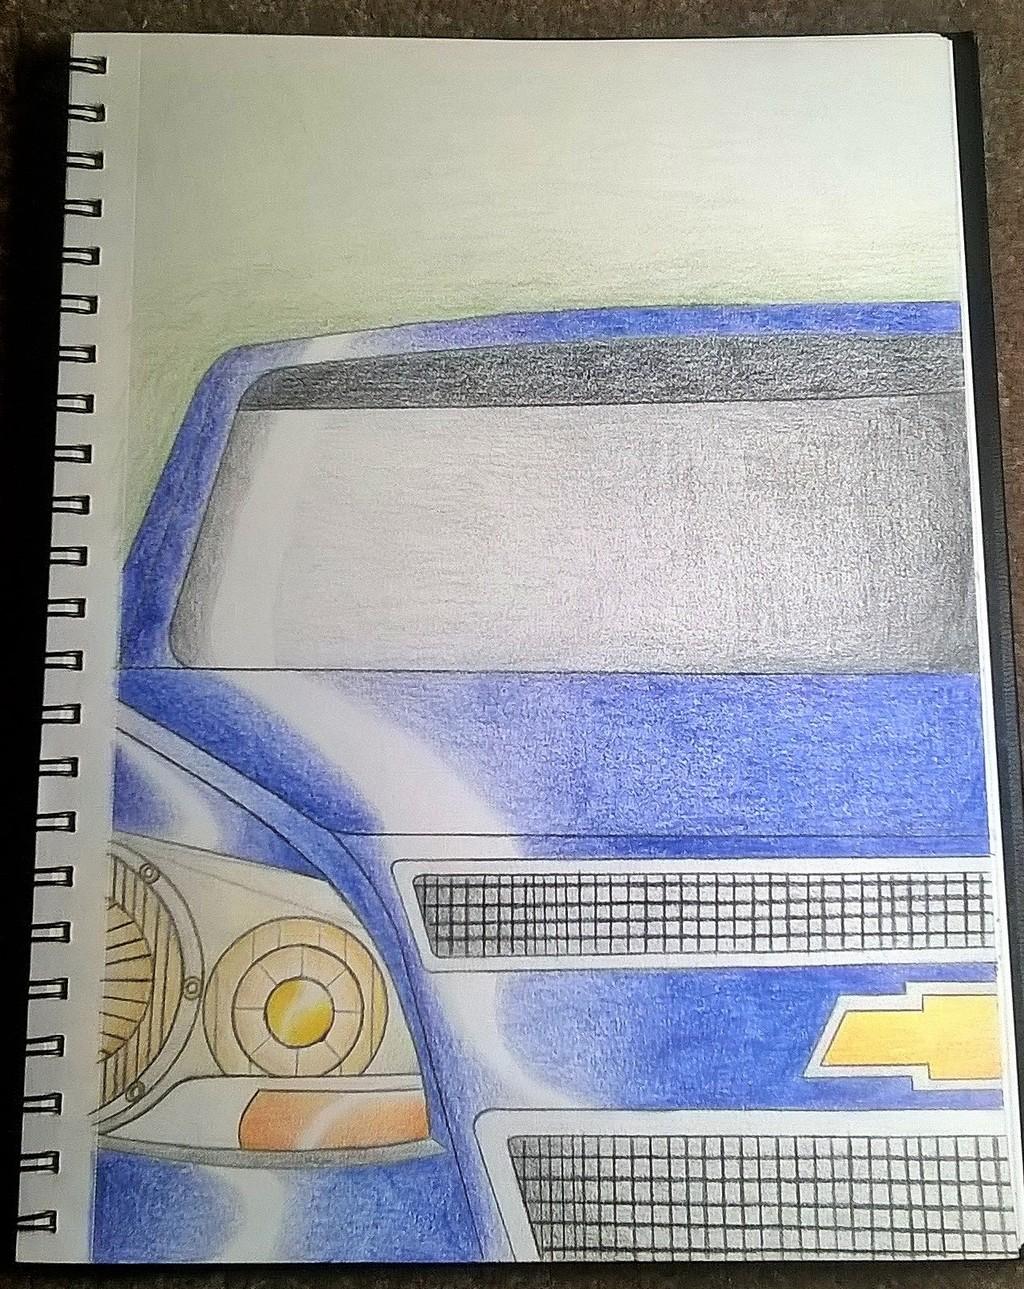 Chevy Malibu Sketch Gift